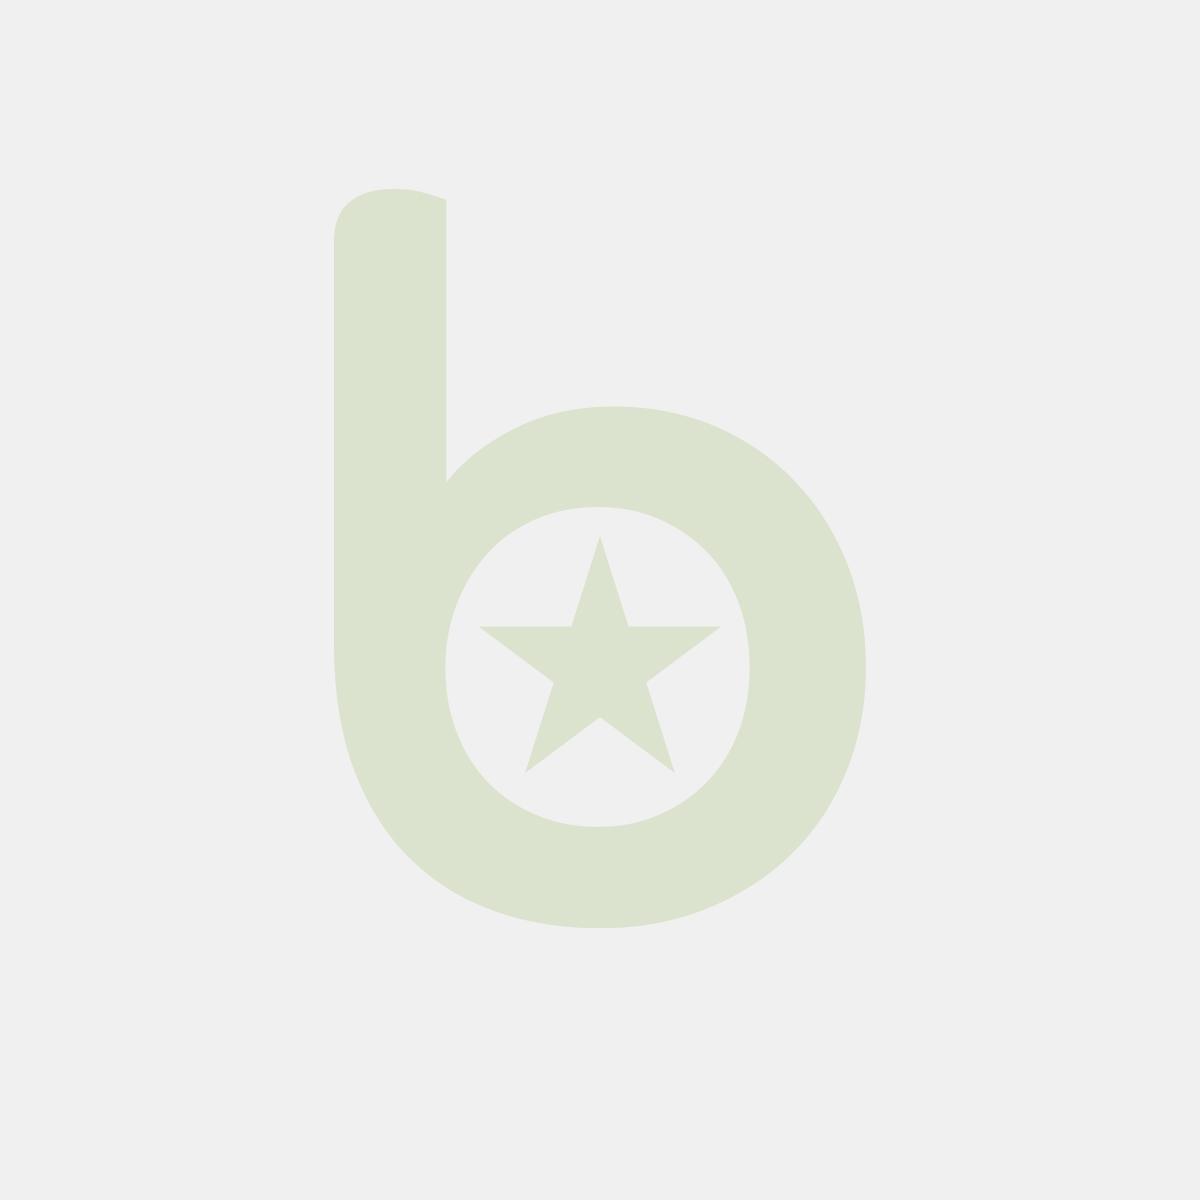 "FINGERFOOD - pucharek ""POSEJDON"" krystaliczny PS 15x9,1xh.3,5cm op. 10 sztuk"